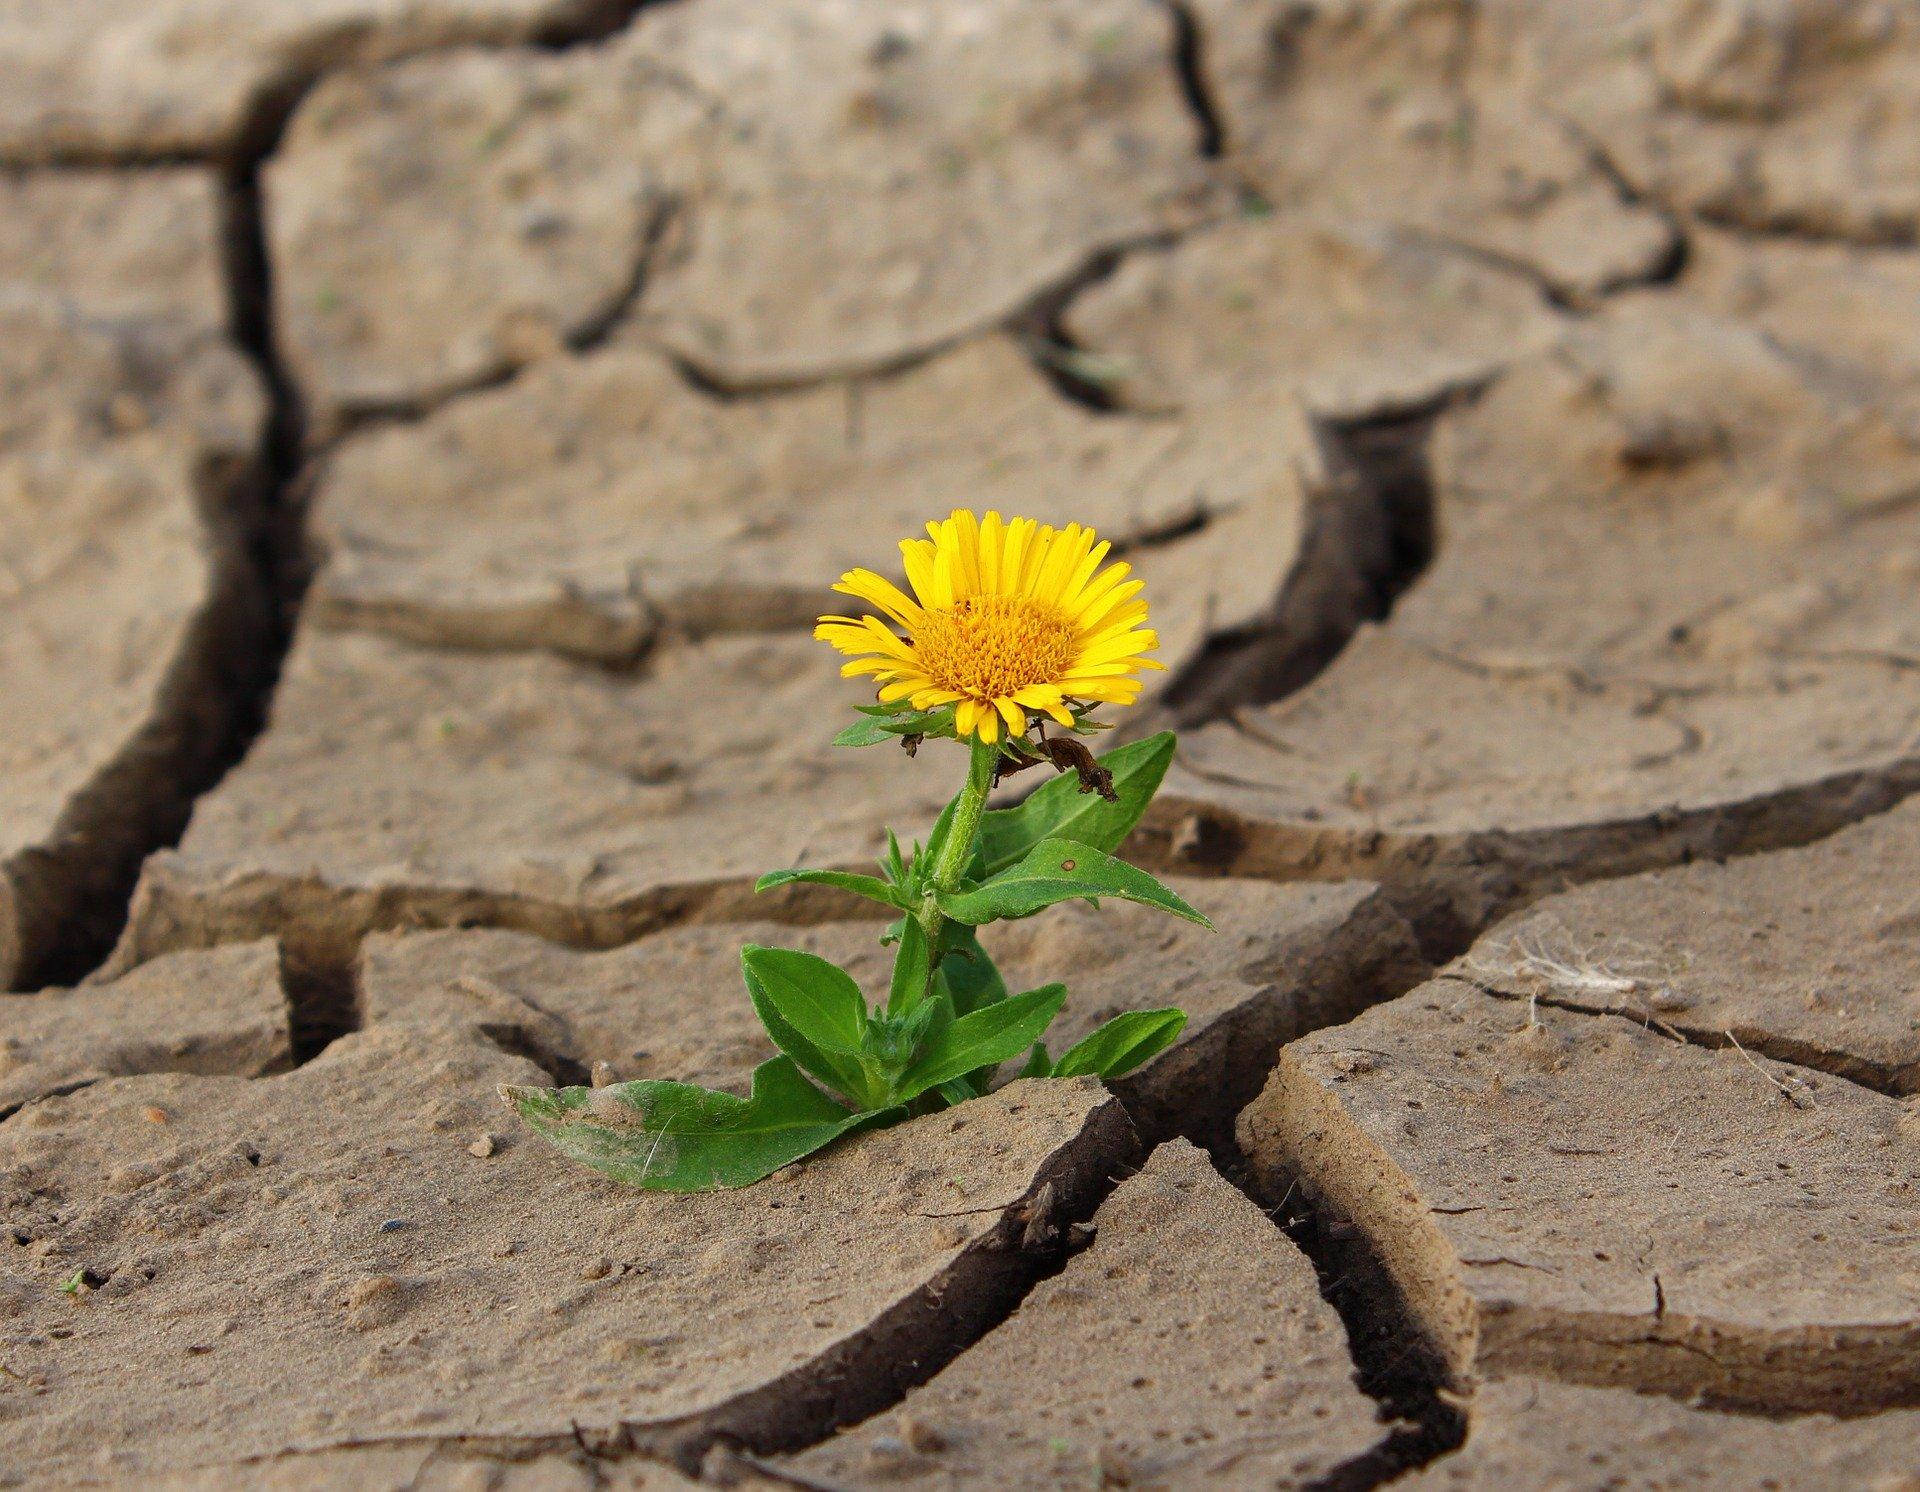 A yellow flower growing through cracks in the desert. Photo courtesy of Klimkin on Pixabay.